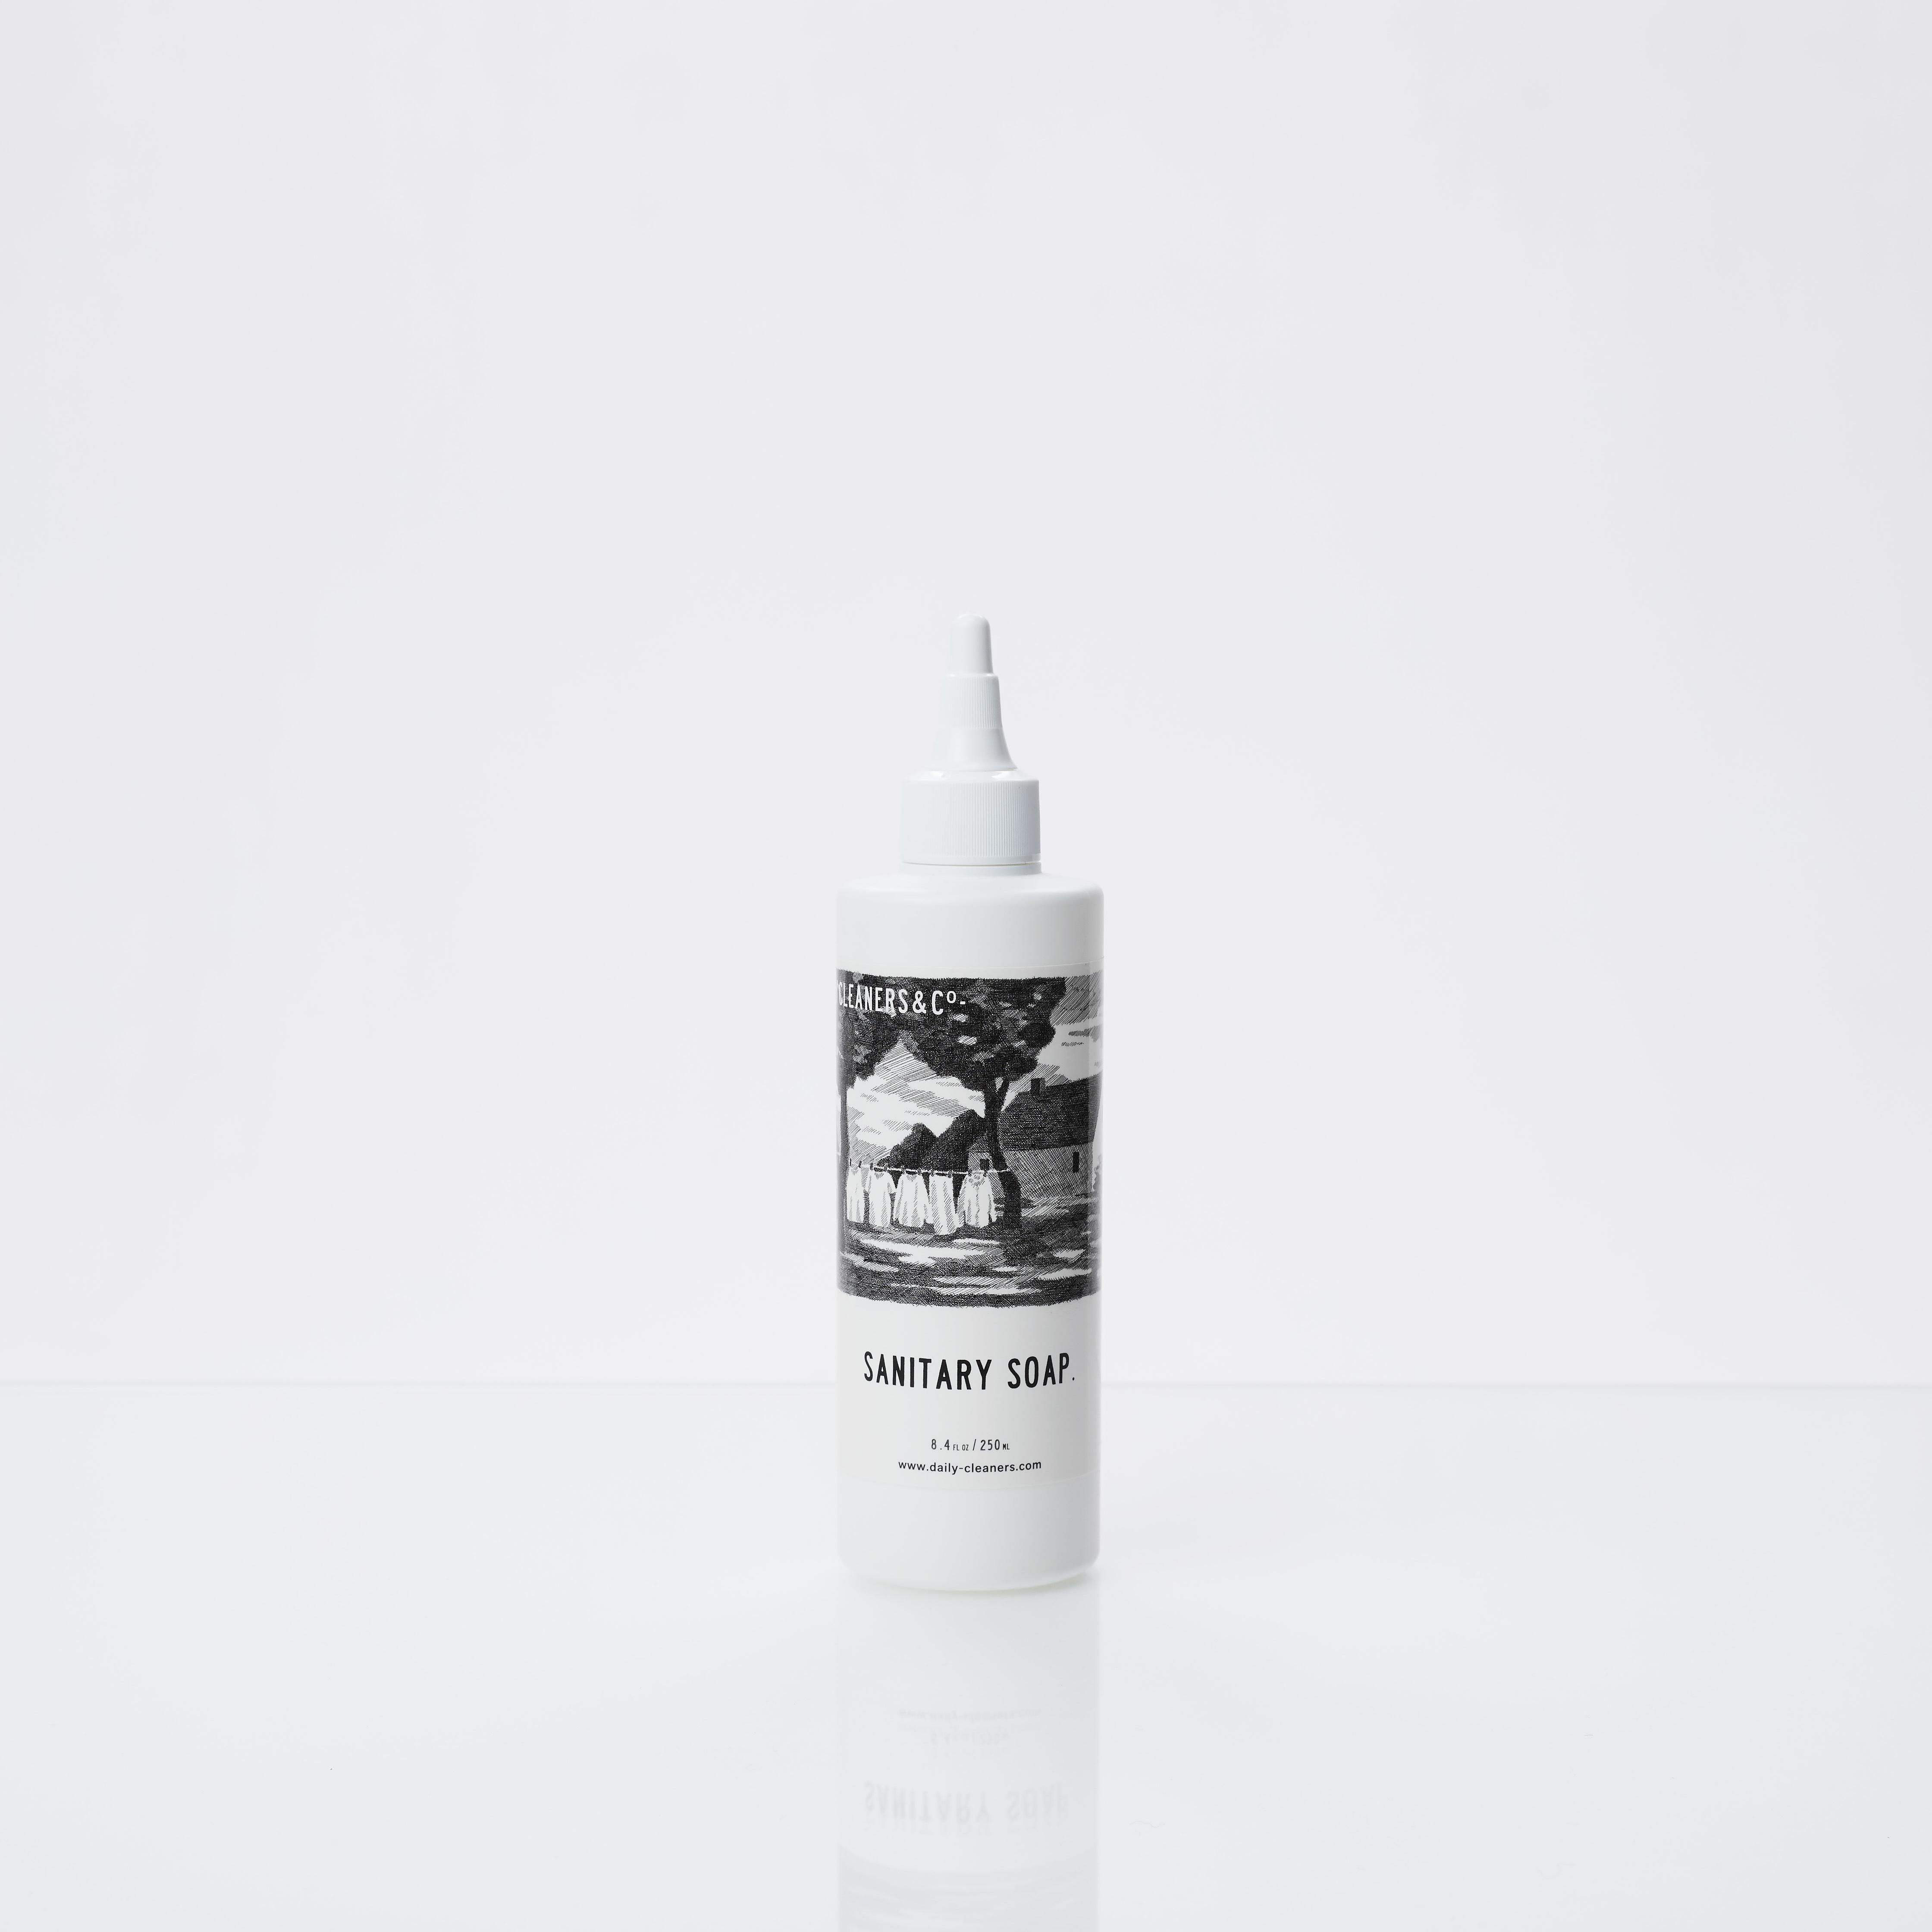 SANITARY SOAP _ 血液・タンパク質汚れ専用洗剤